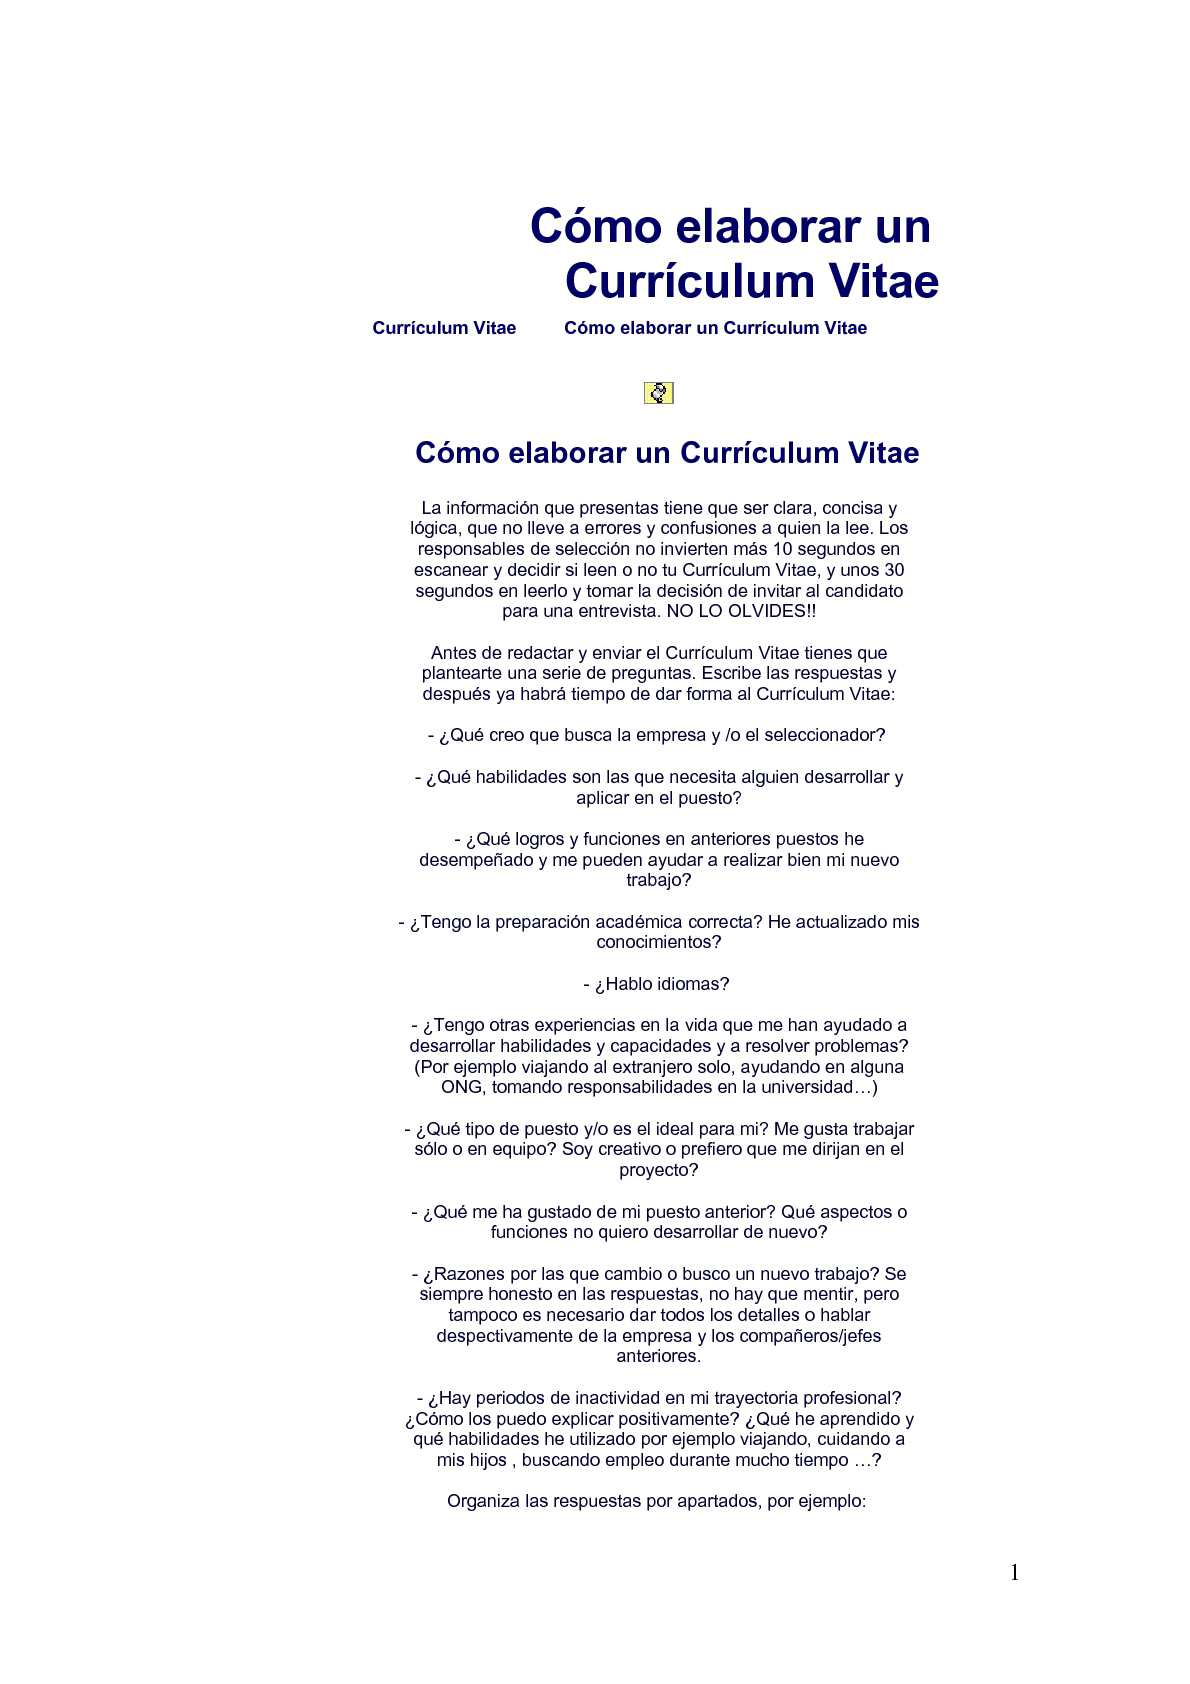 Calaméo - Cómo elaborar un Currículum Vitae